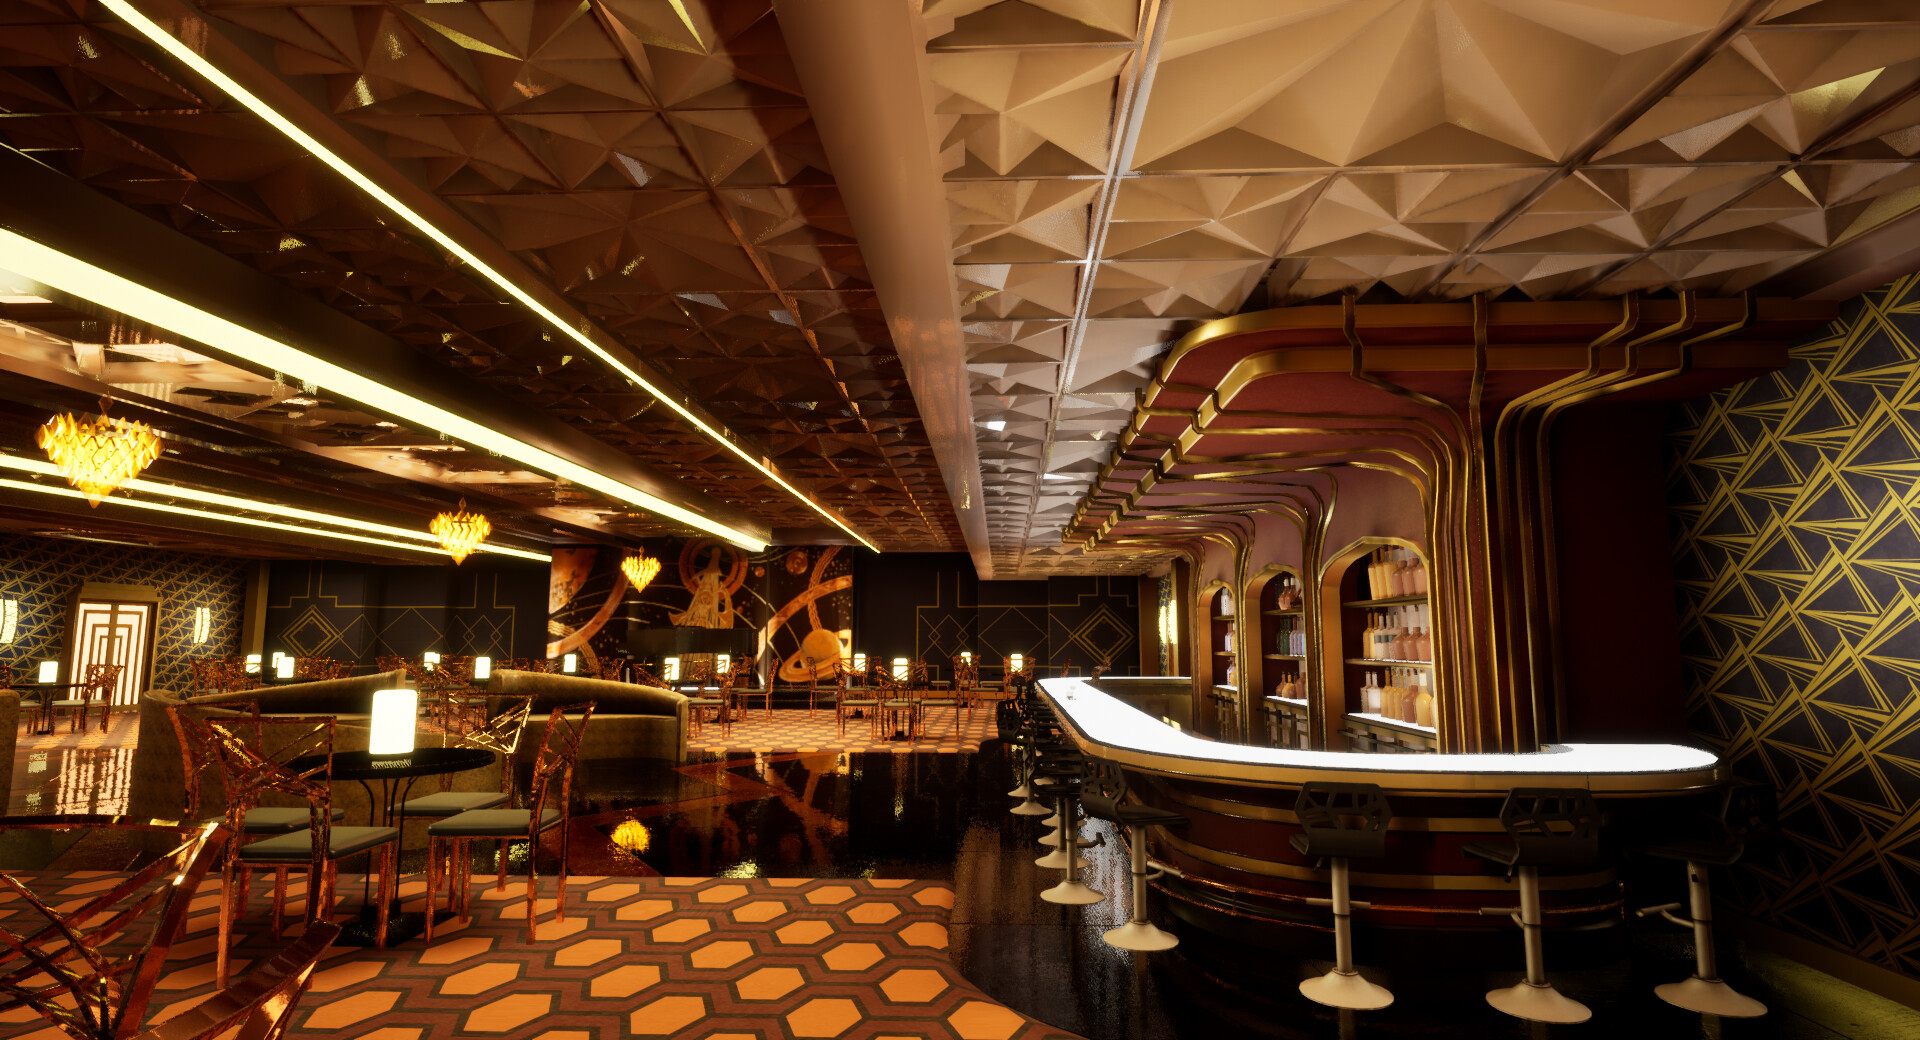 A screenshot of the bar in UE4